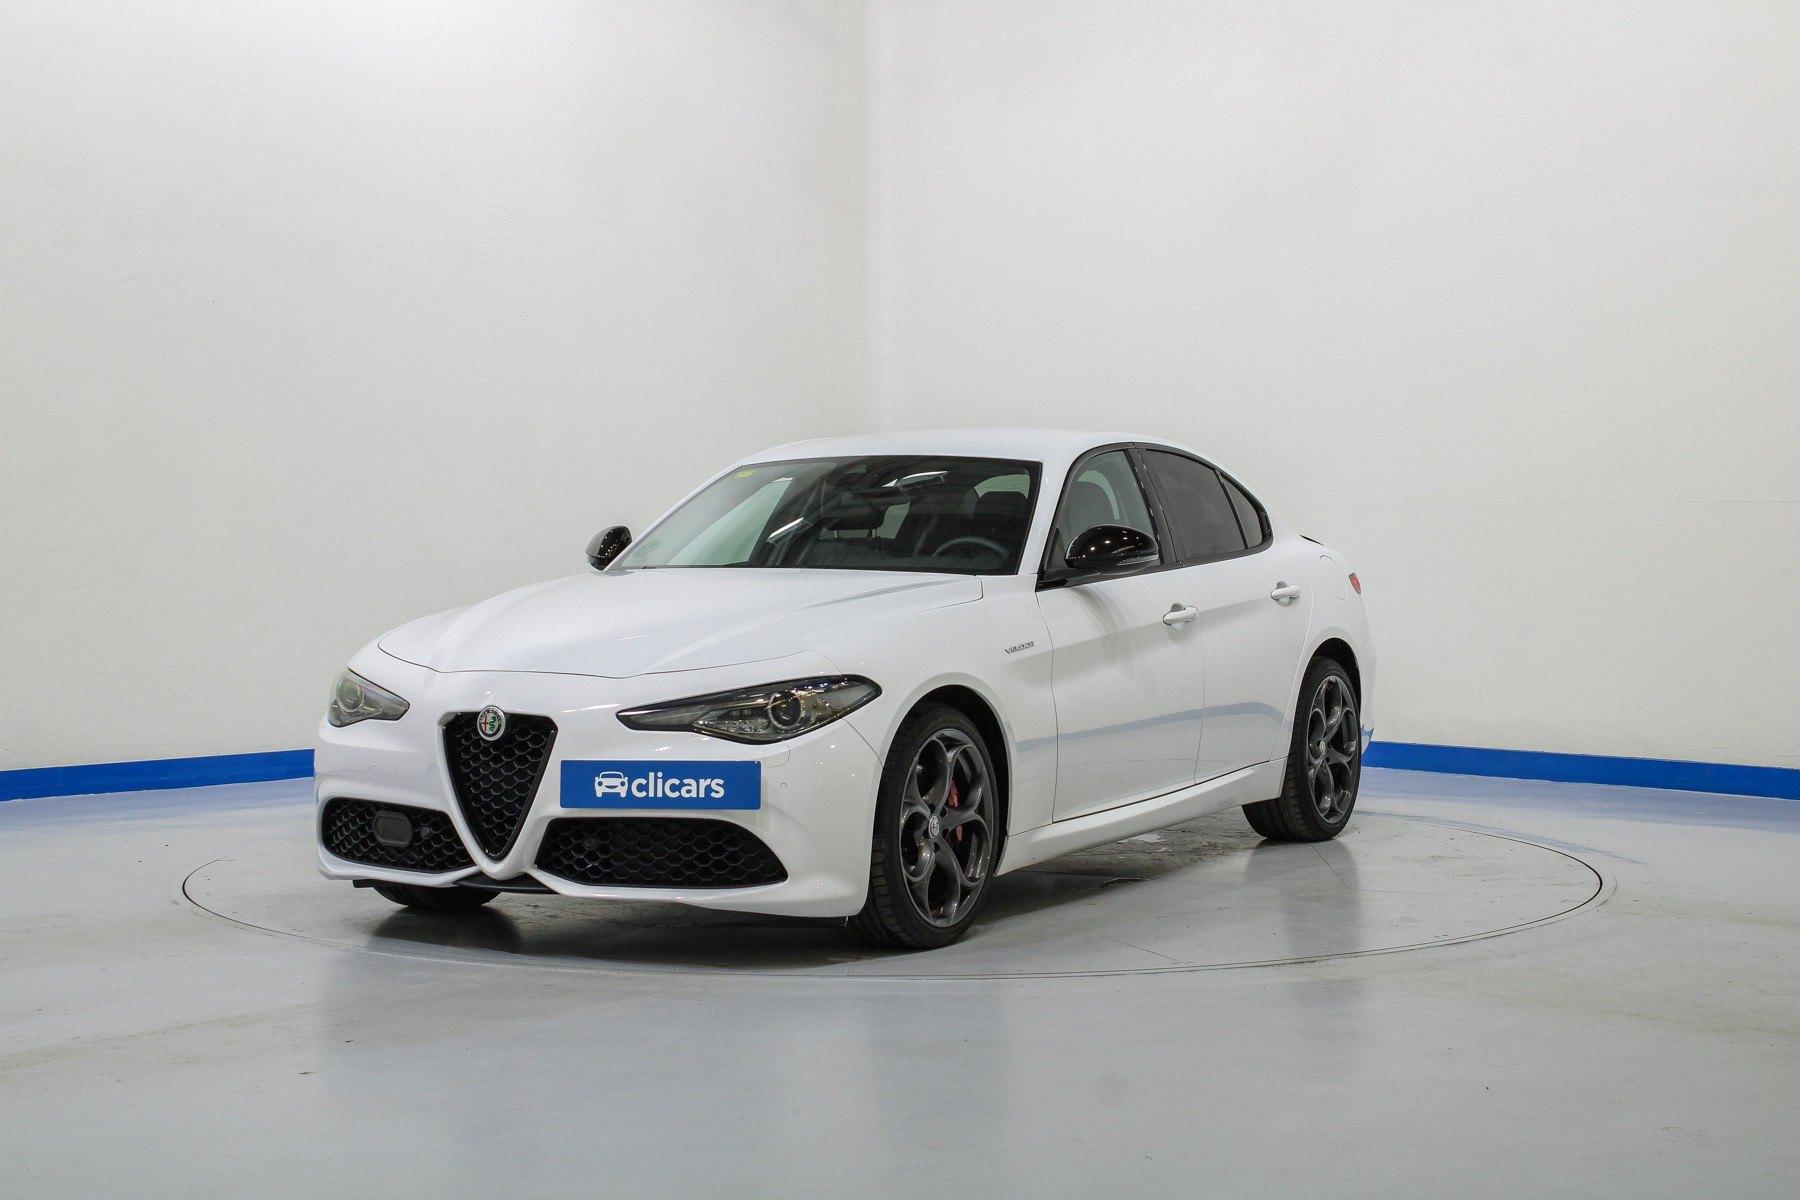 Alfa Romeo Giulia Diésel 2.2 JTDM 154kW (210CV) Veloce ATX 1